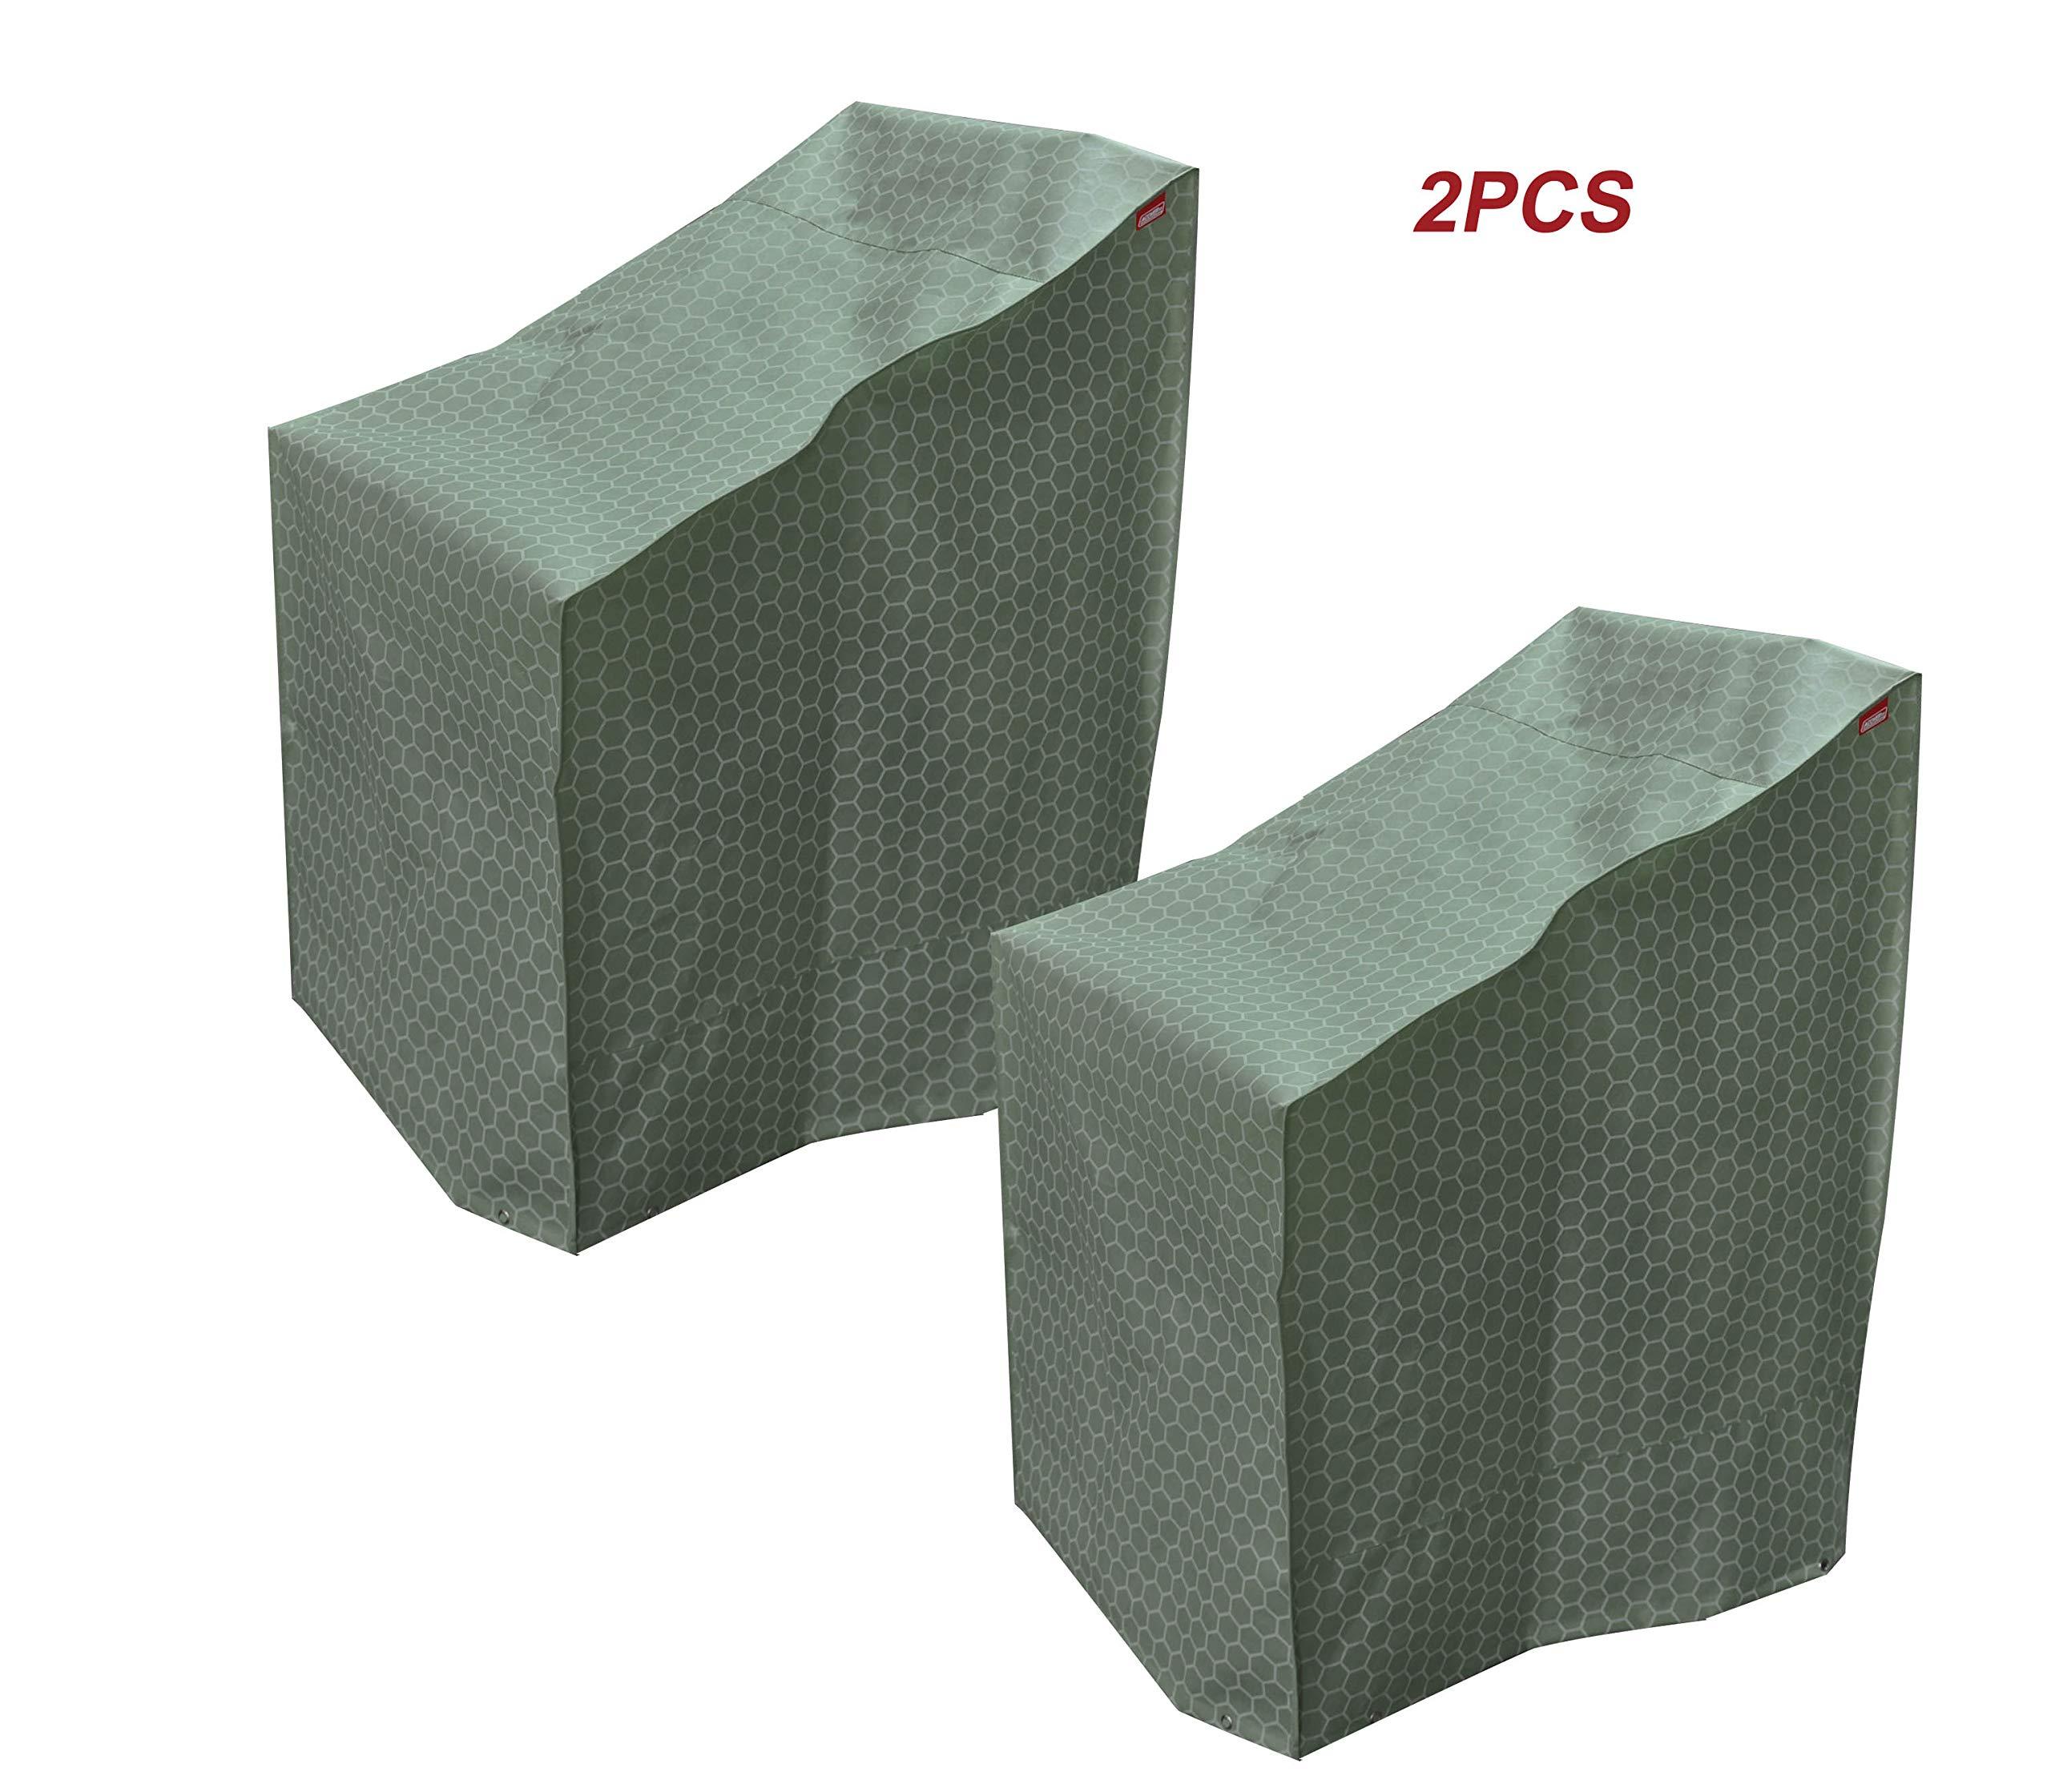 acoveritt Honey Comb Series -2PCS Waterproof Heavy Duty Stackable-Chair Patio Cover (26'' WX34 DX45 H)